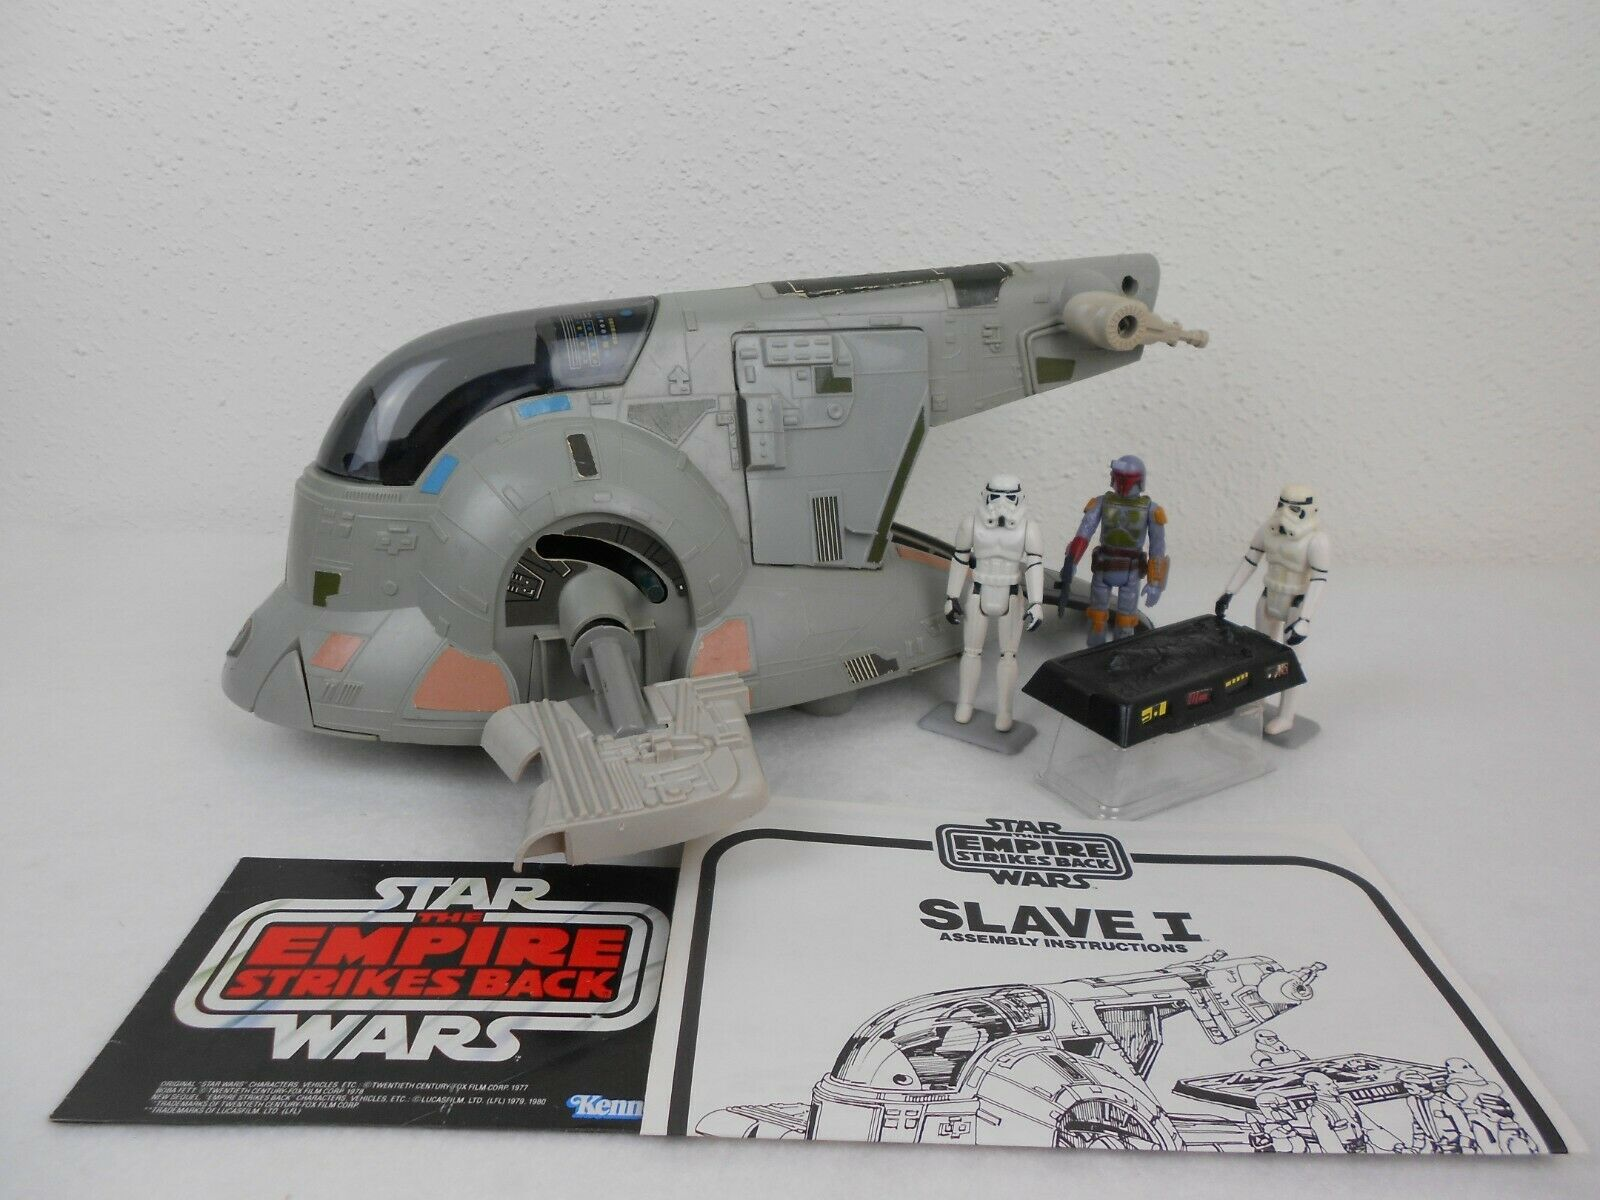 Vintage Star Wars ESB 1981 Slave One  Very Nice  - Fully Functional - Complete